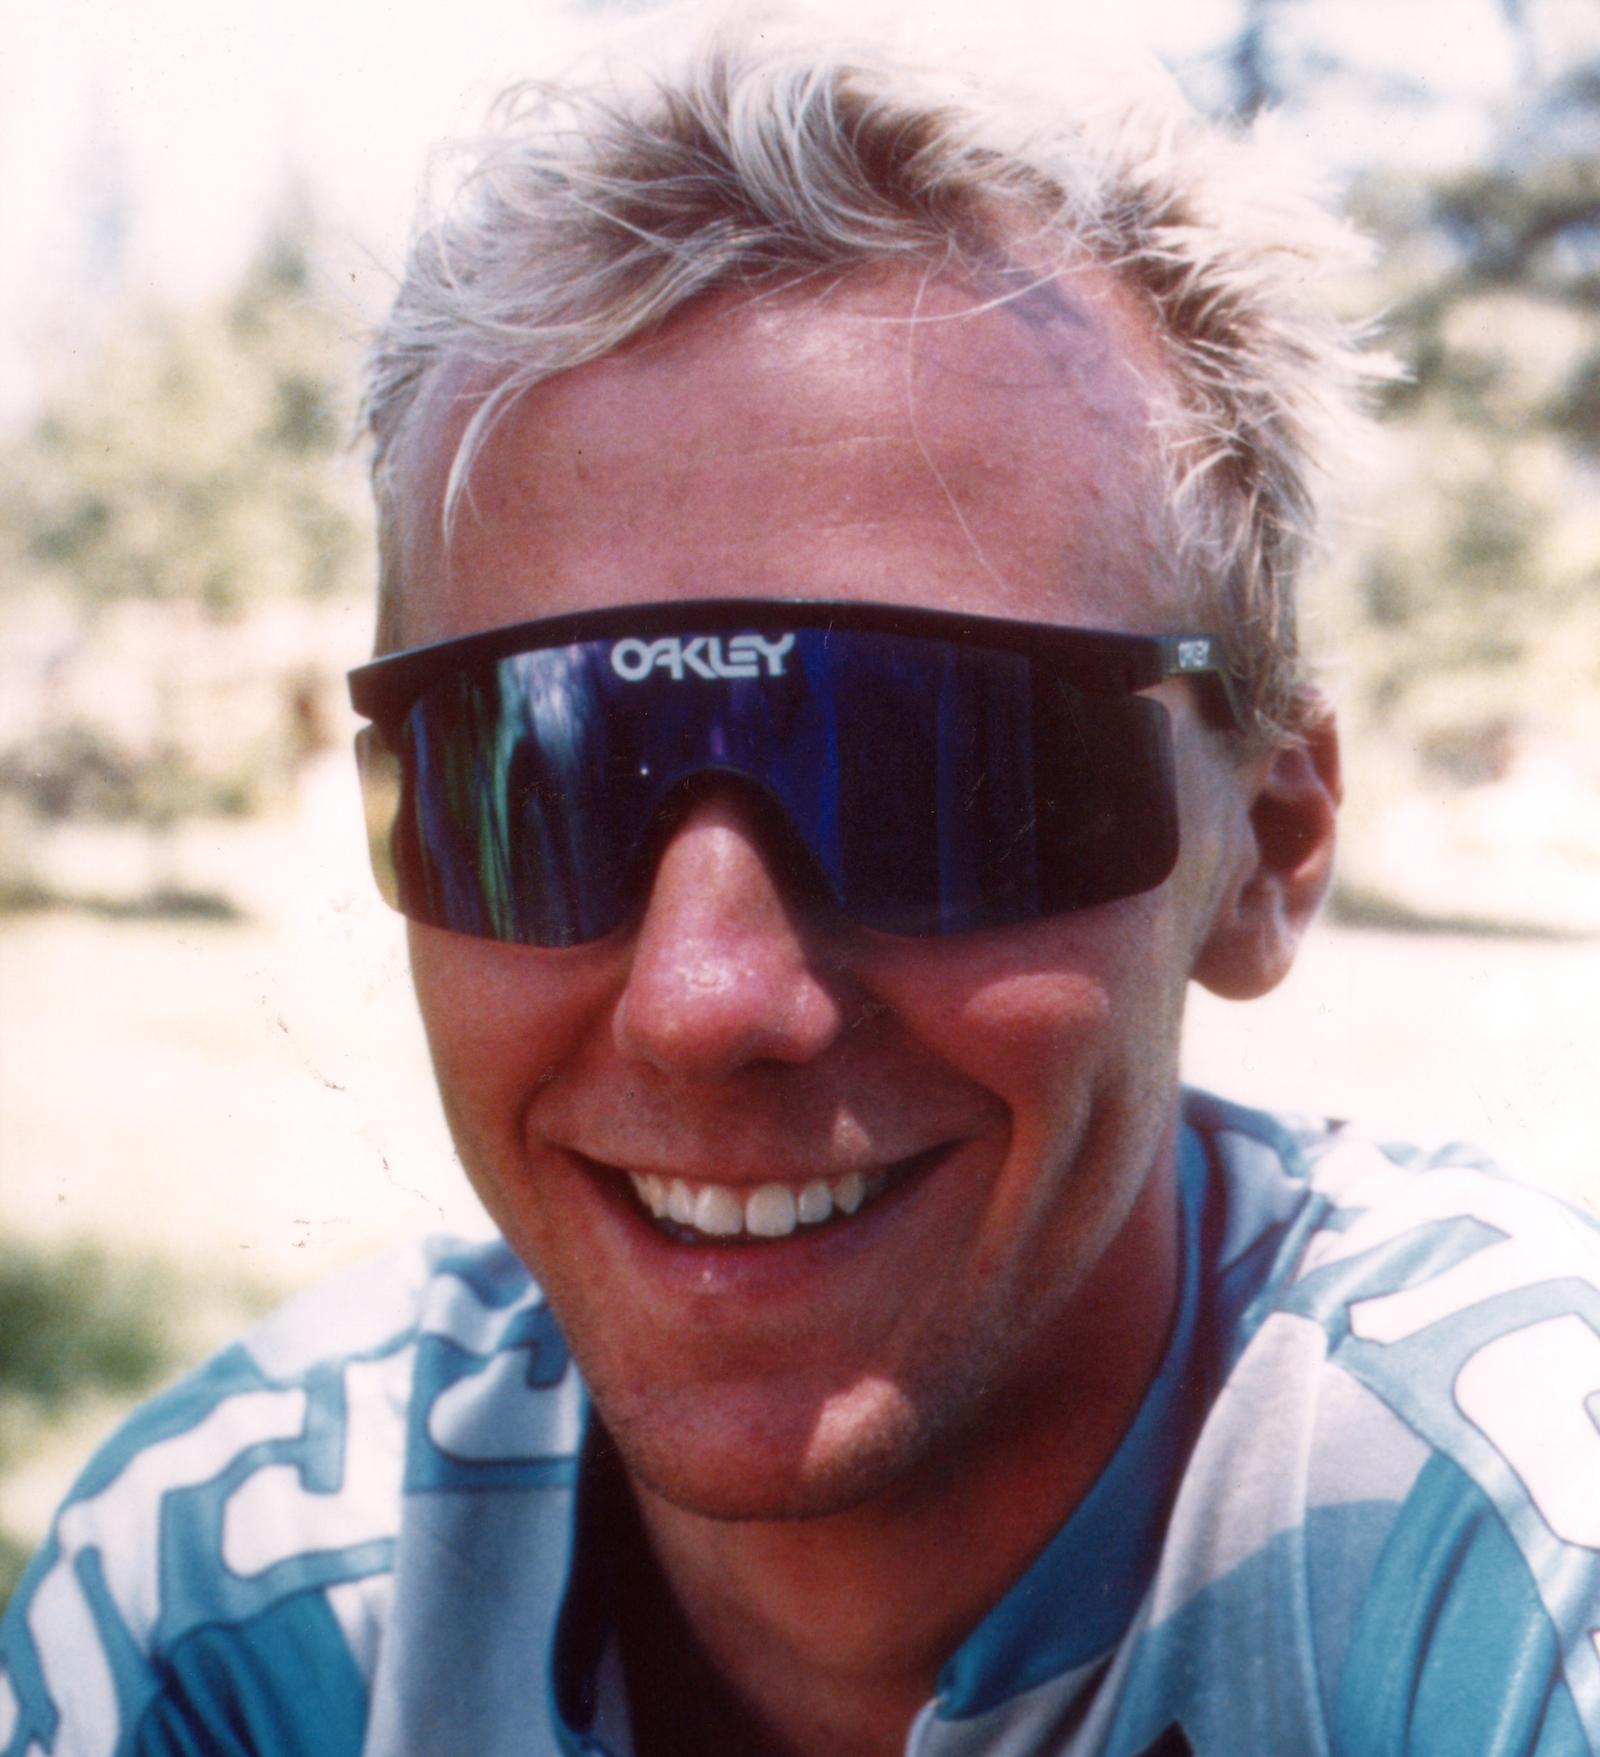 John_Tomac_in_Big_Bear_1987_Photo_by_Patty_Mooney